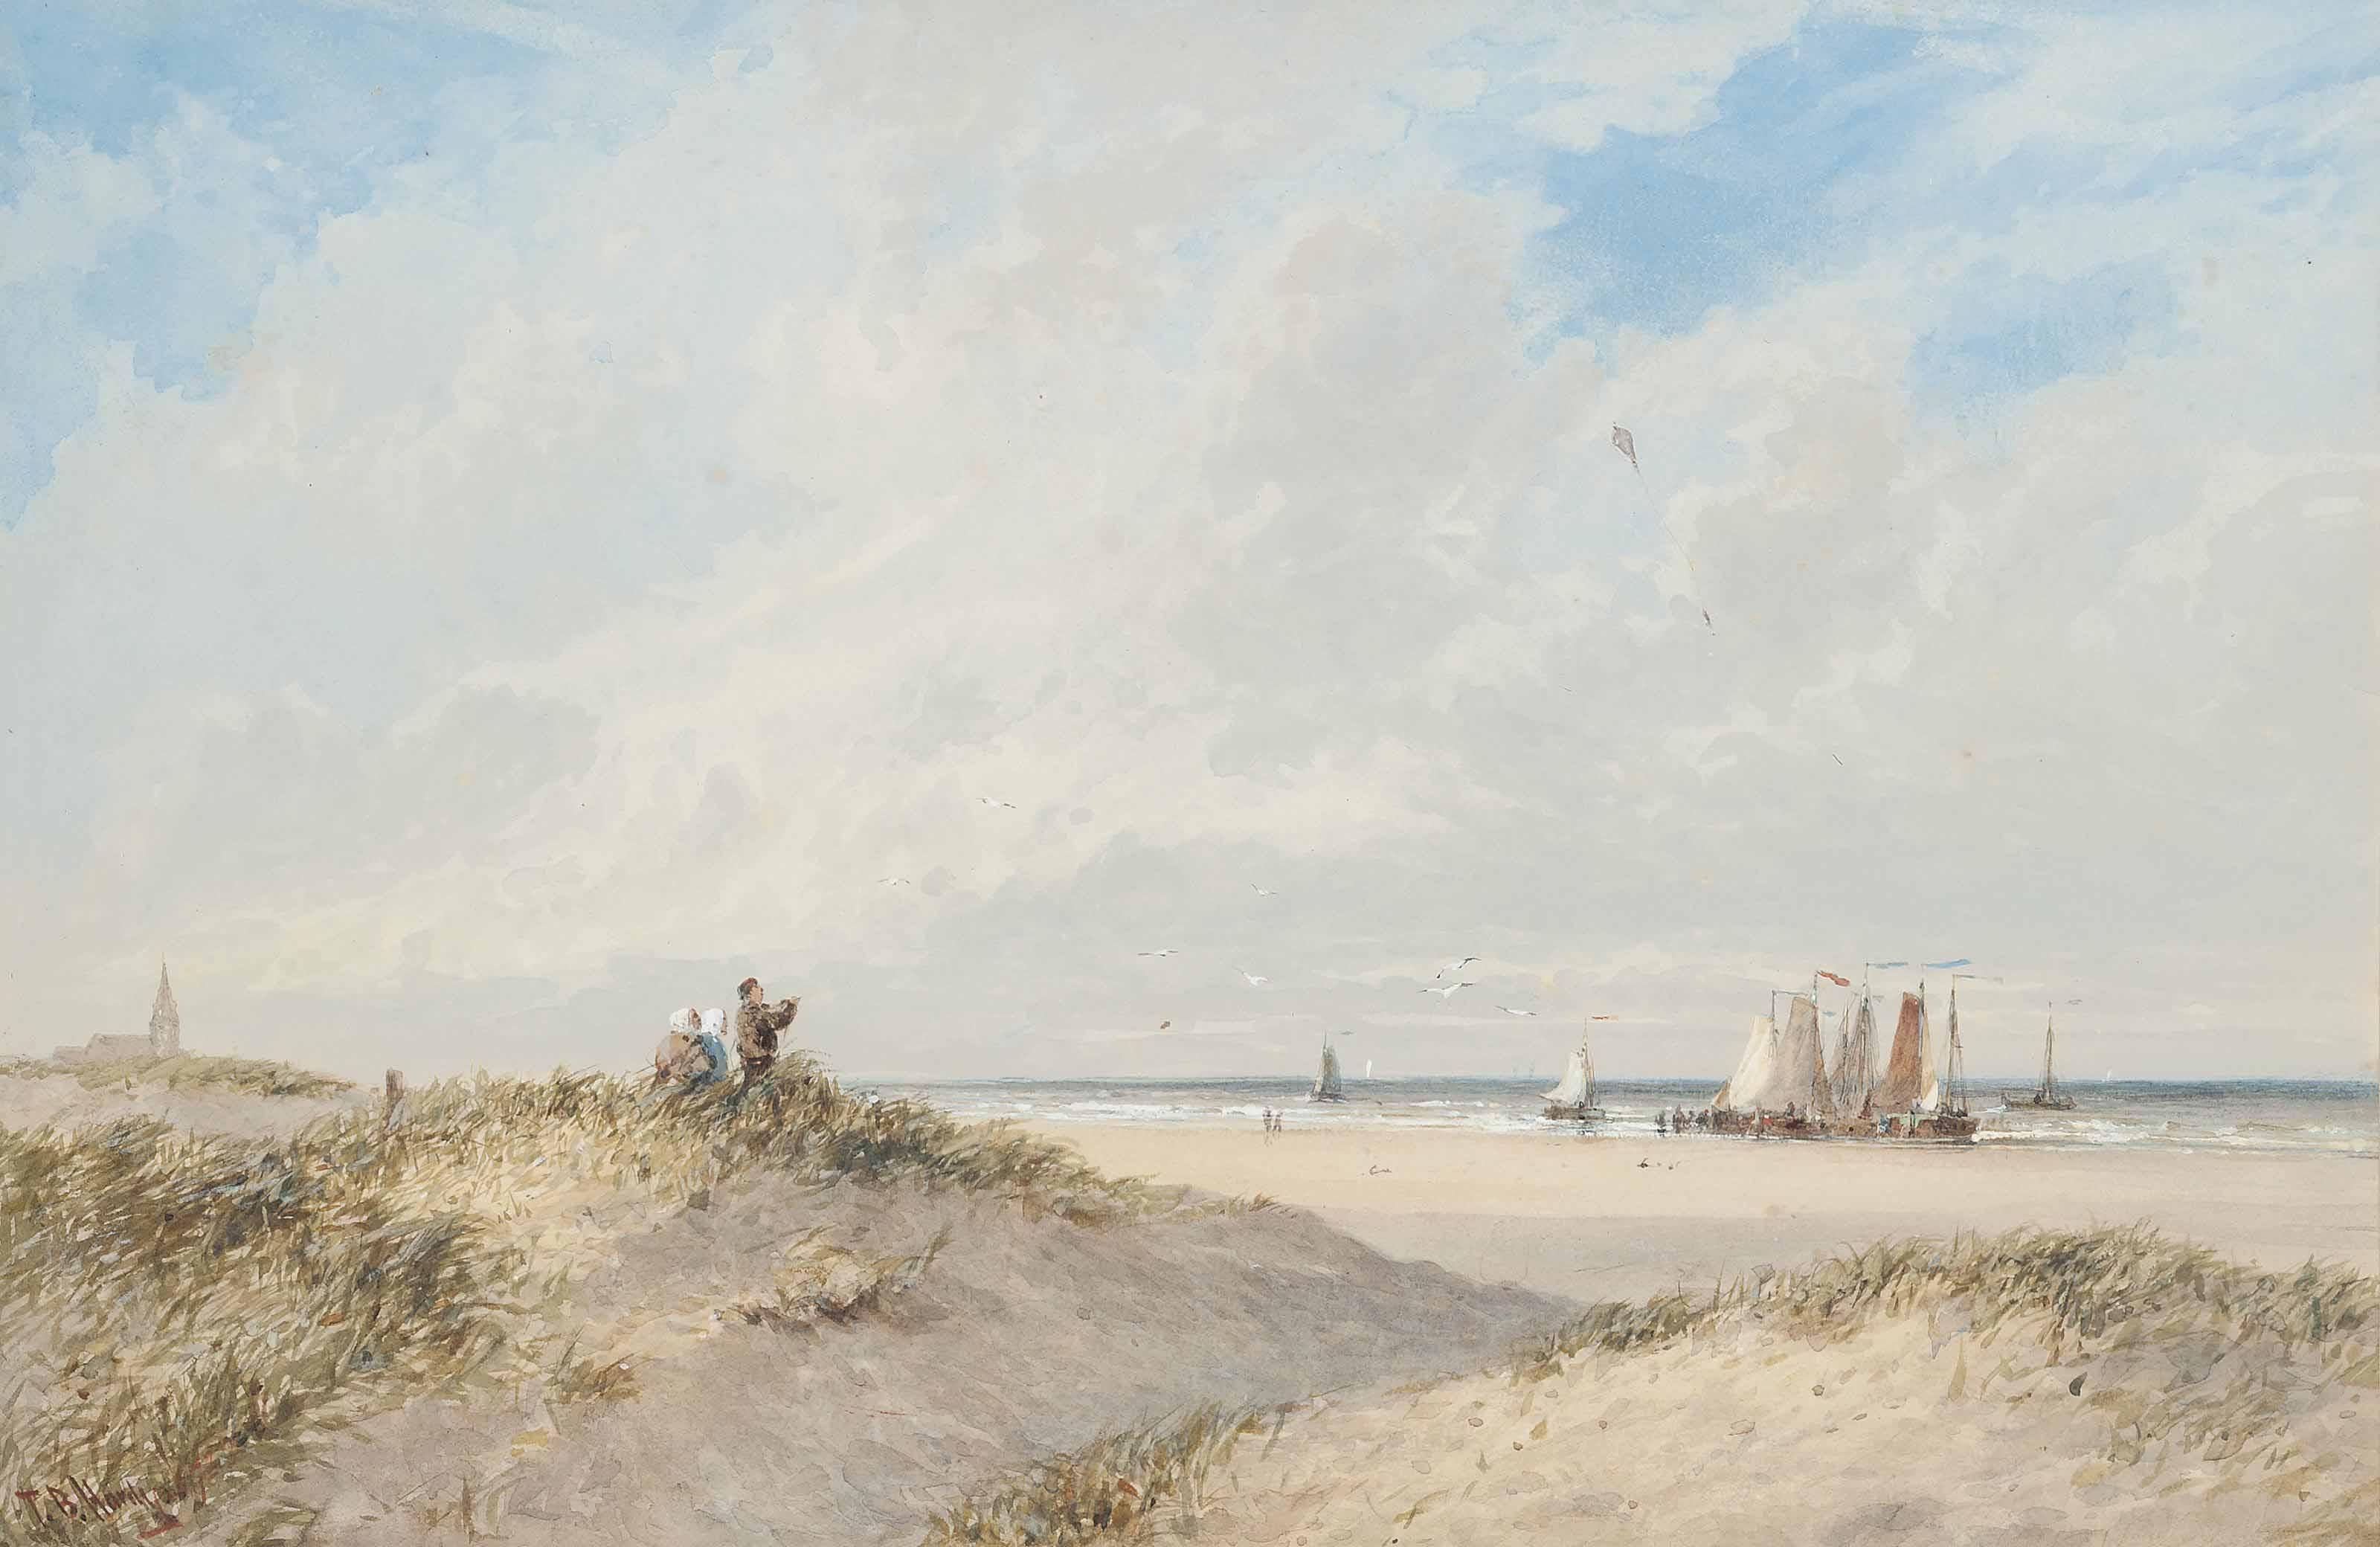 Kite flying on the coast near Scheveningen